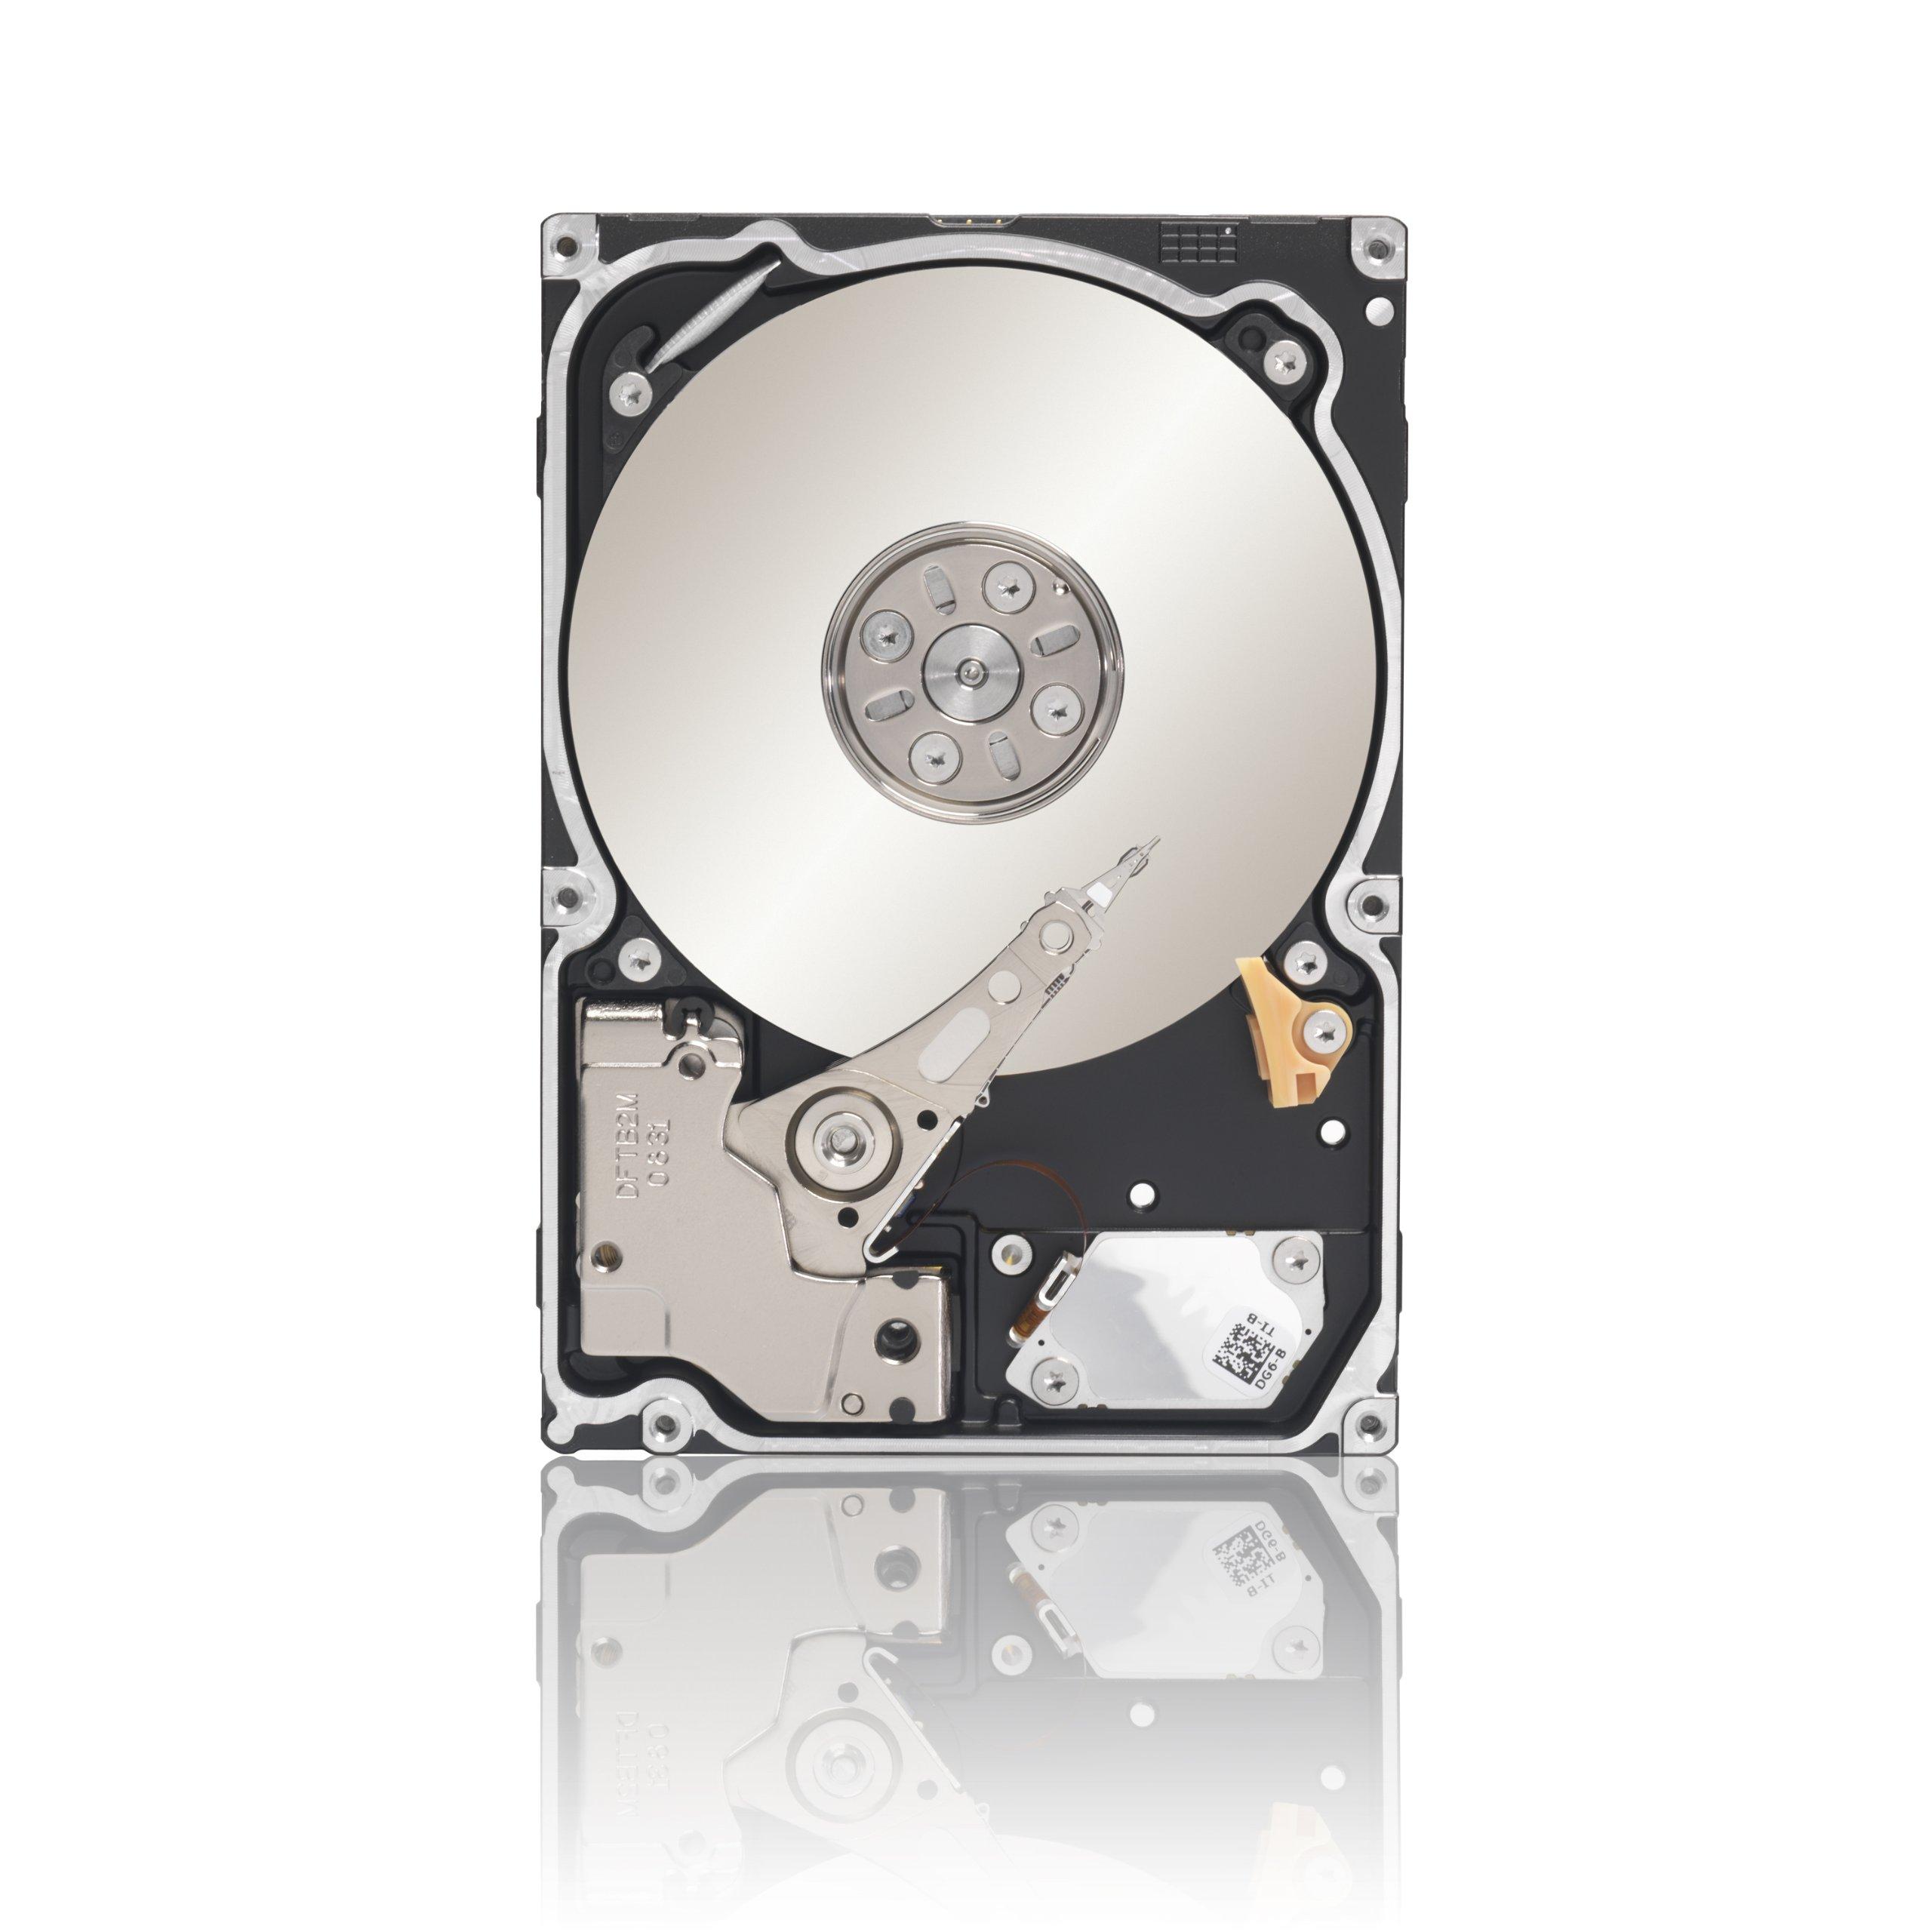 Seagate 2TB Enterprise Capacity HDD SATA 6Gb/s 128MB Cache 3.5-Inch Internal Bare Drive (ST2000NM0033) by Seagate